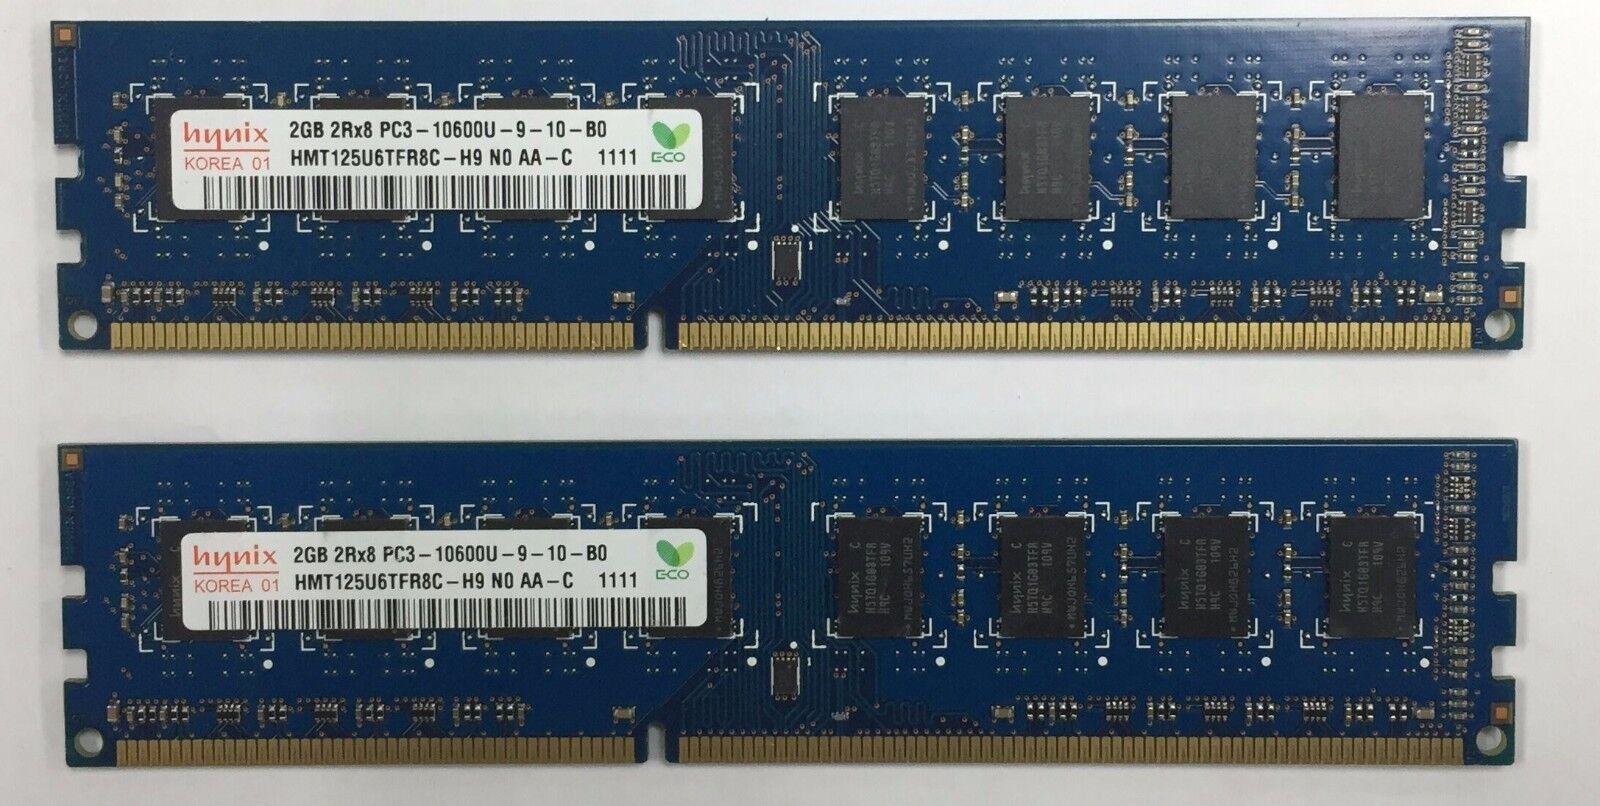 Samsung Kingston Hynix 4gb *2x2gb 2Rx8 PC3-10600U-9-10-B0 240 Pin Memory *TESTED